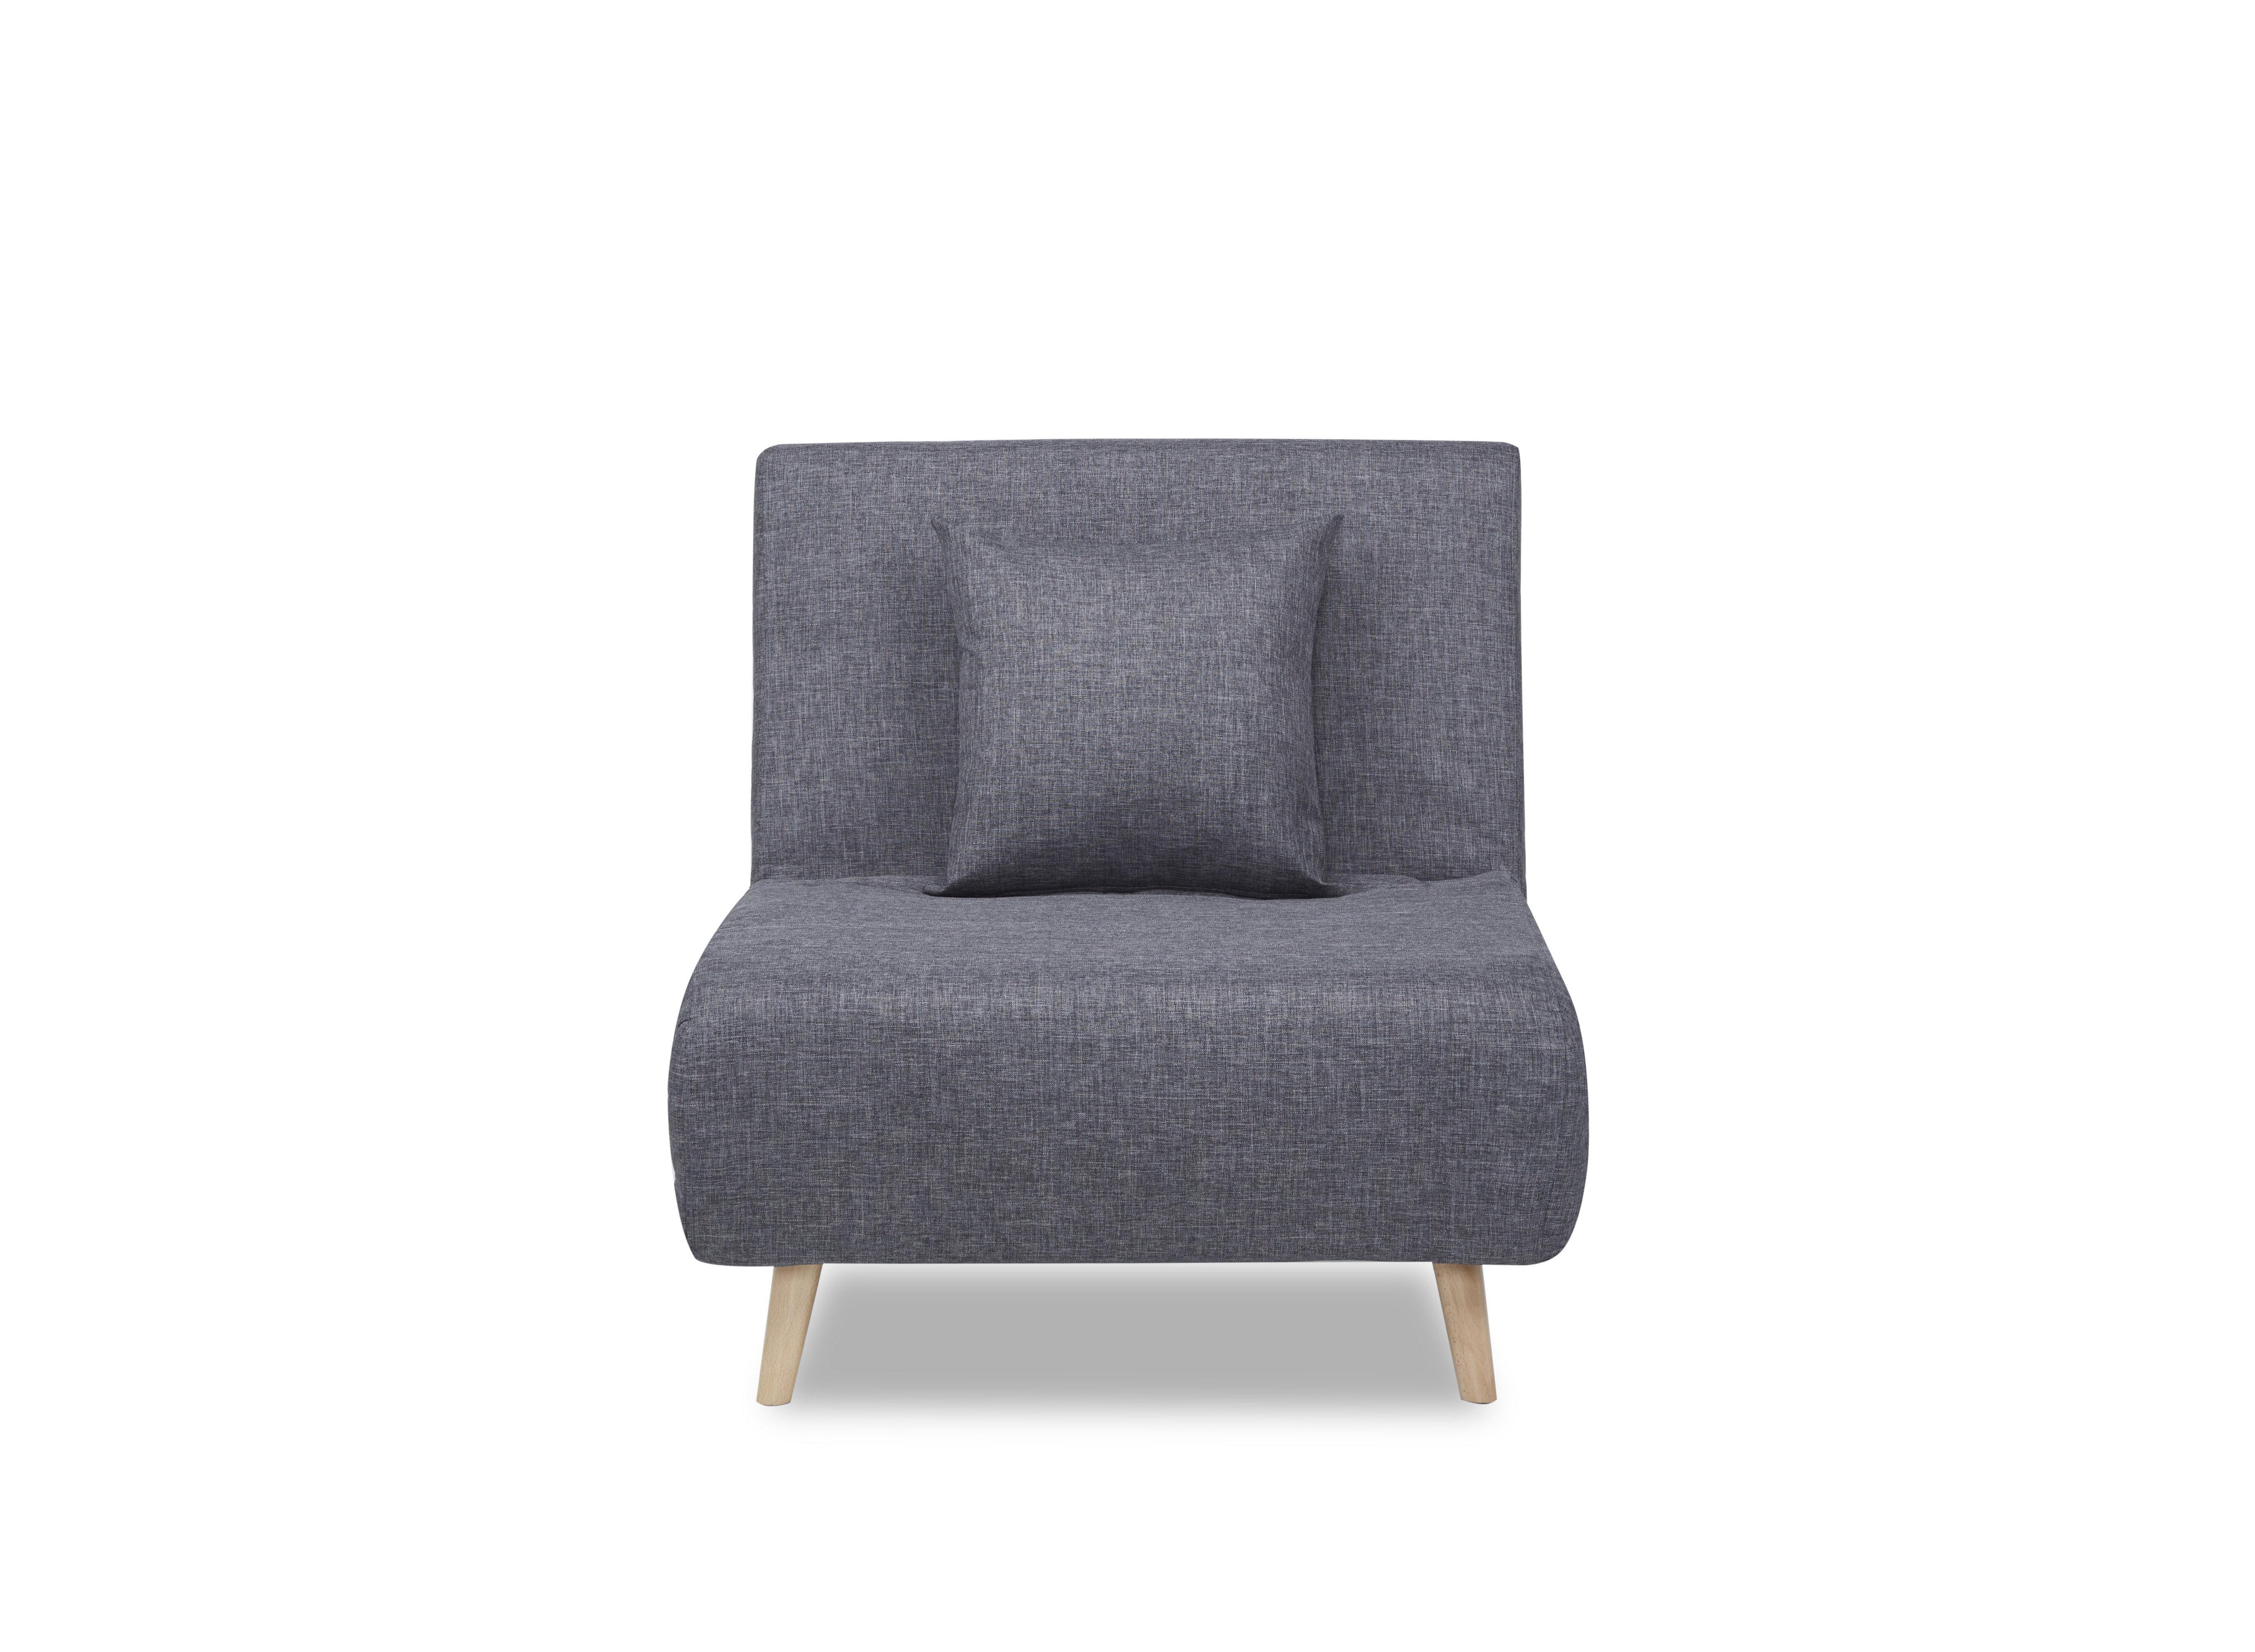 alpine bay chair bed